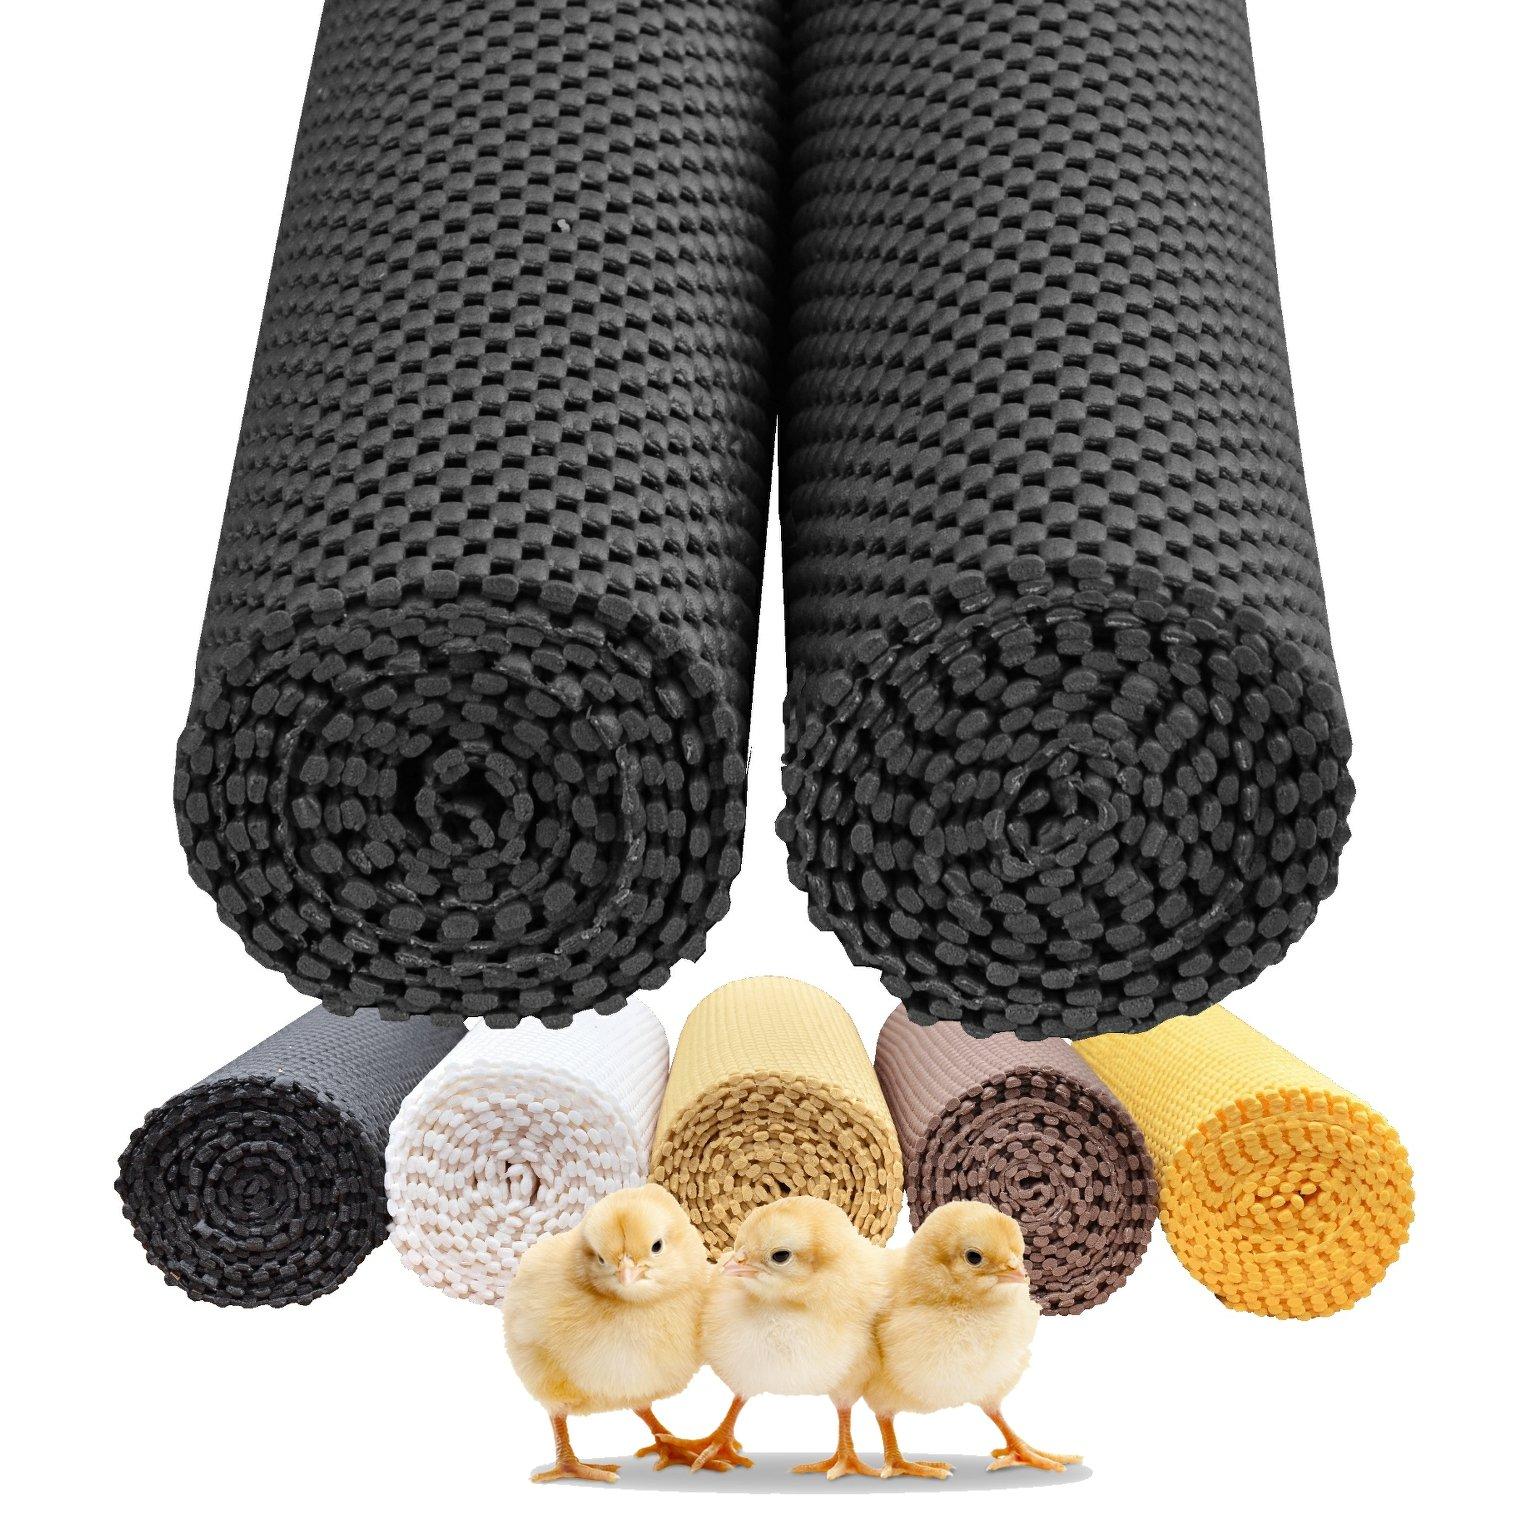 2x Rolls ANTI SLIP GRIP MAT Ducks Chicks Brooder Hatcher Incubator Splayed Legs